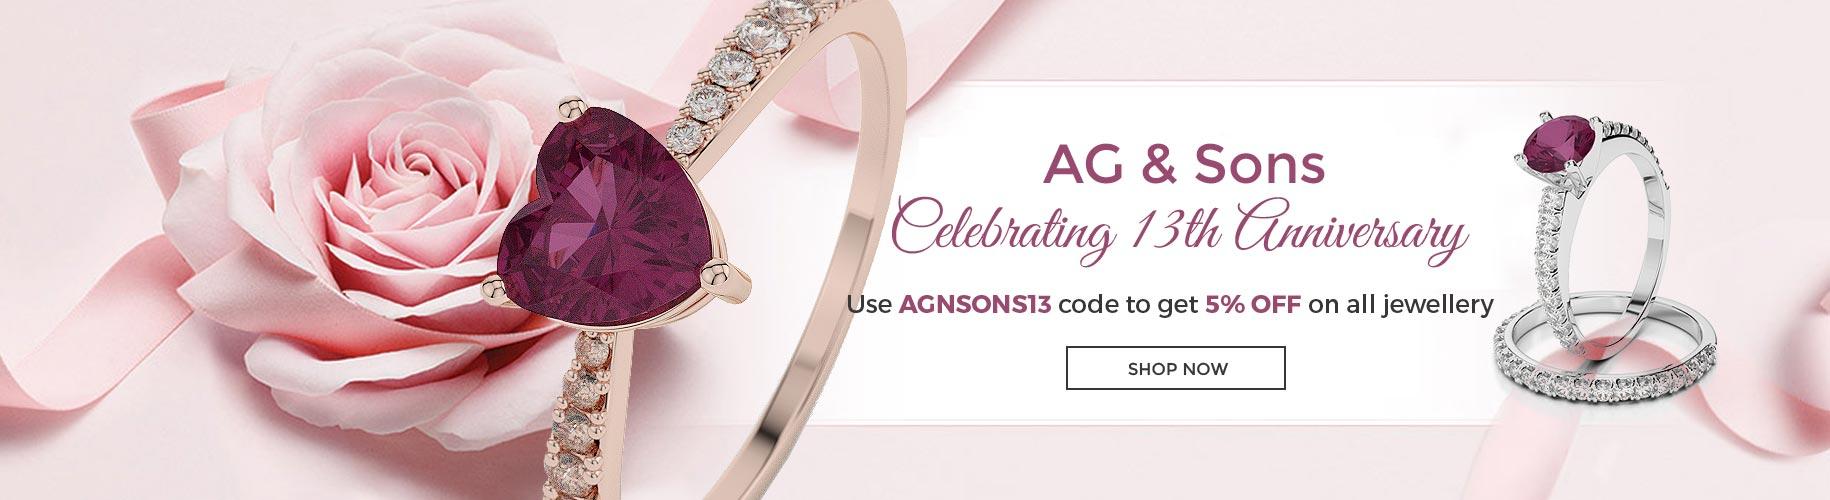 Agnsons Anniversary Offer